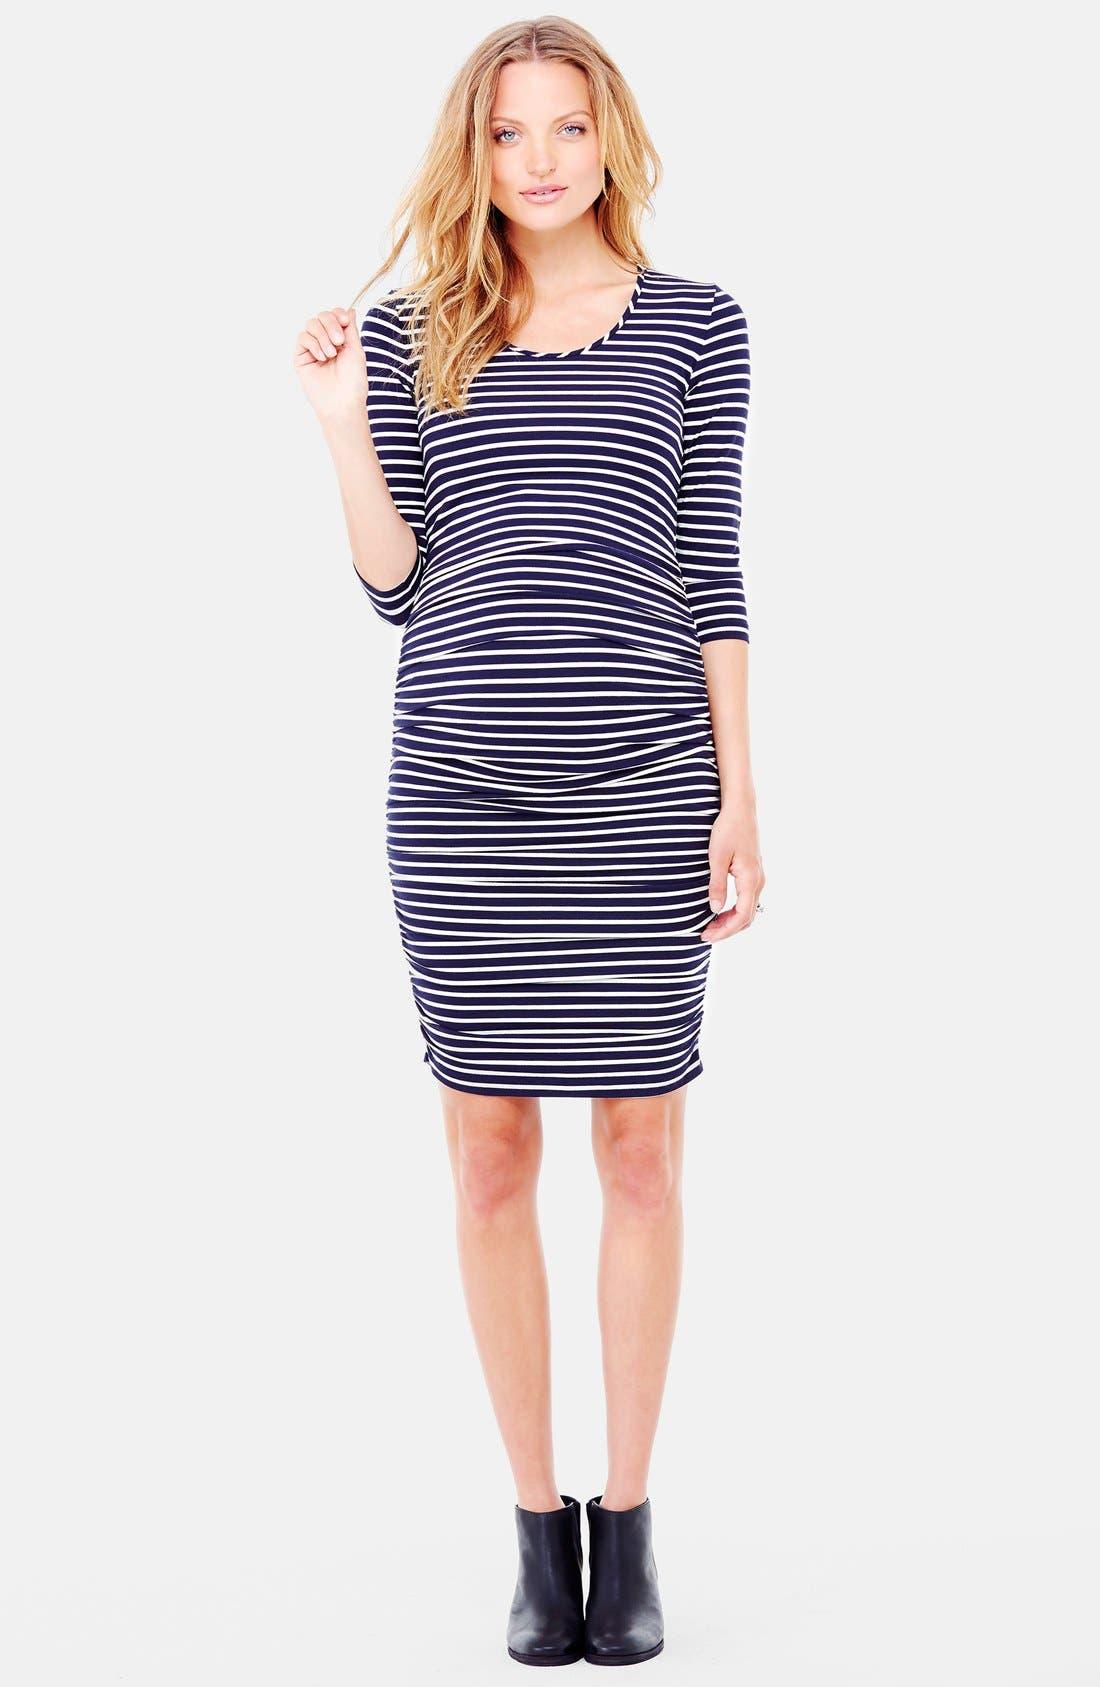 Ingrid & Isabel Shirred Maternity Dress,                             Main thumbnail 1, color,                             True Navy/Cream Stripe